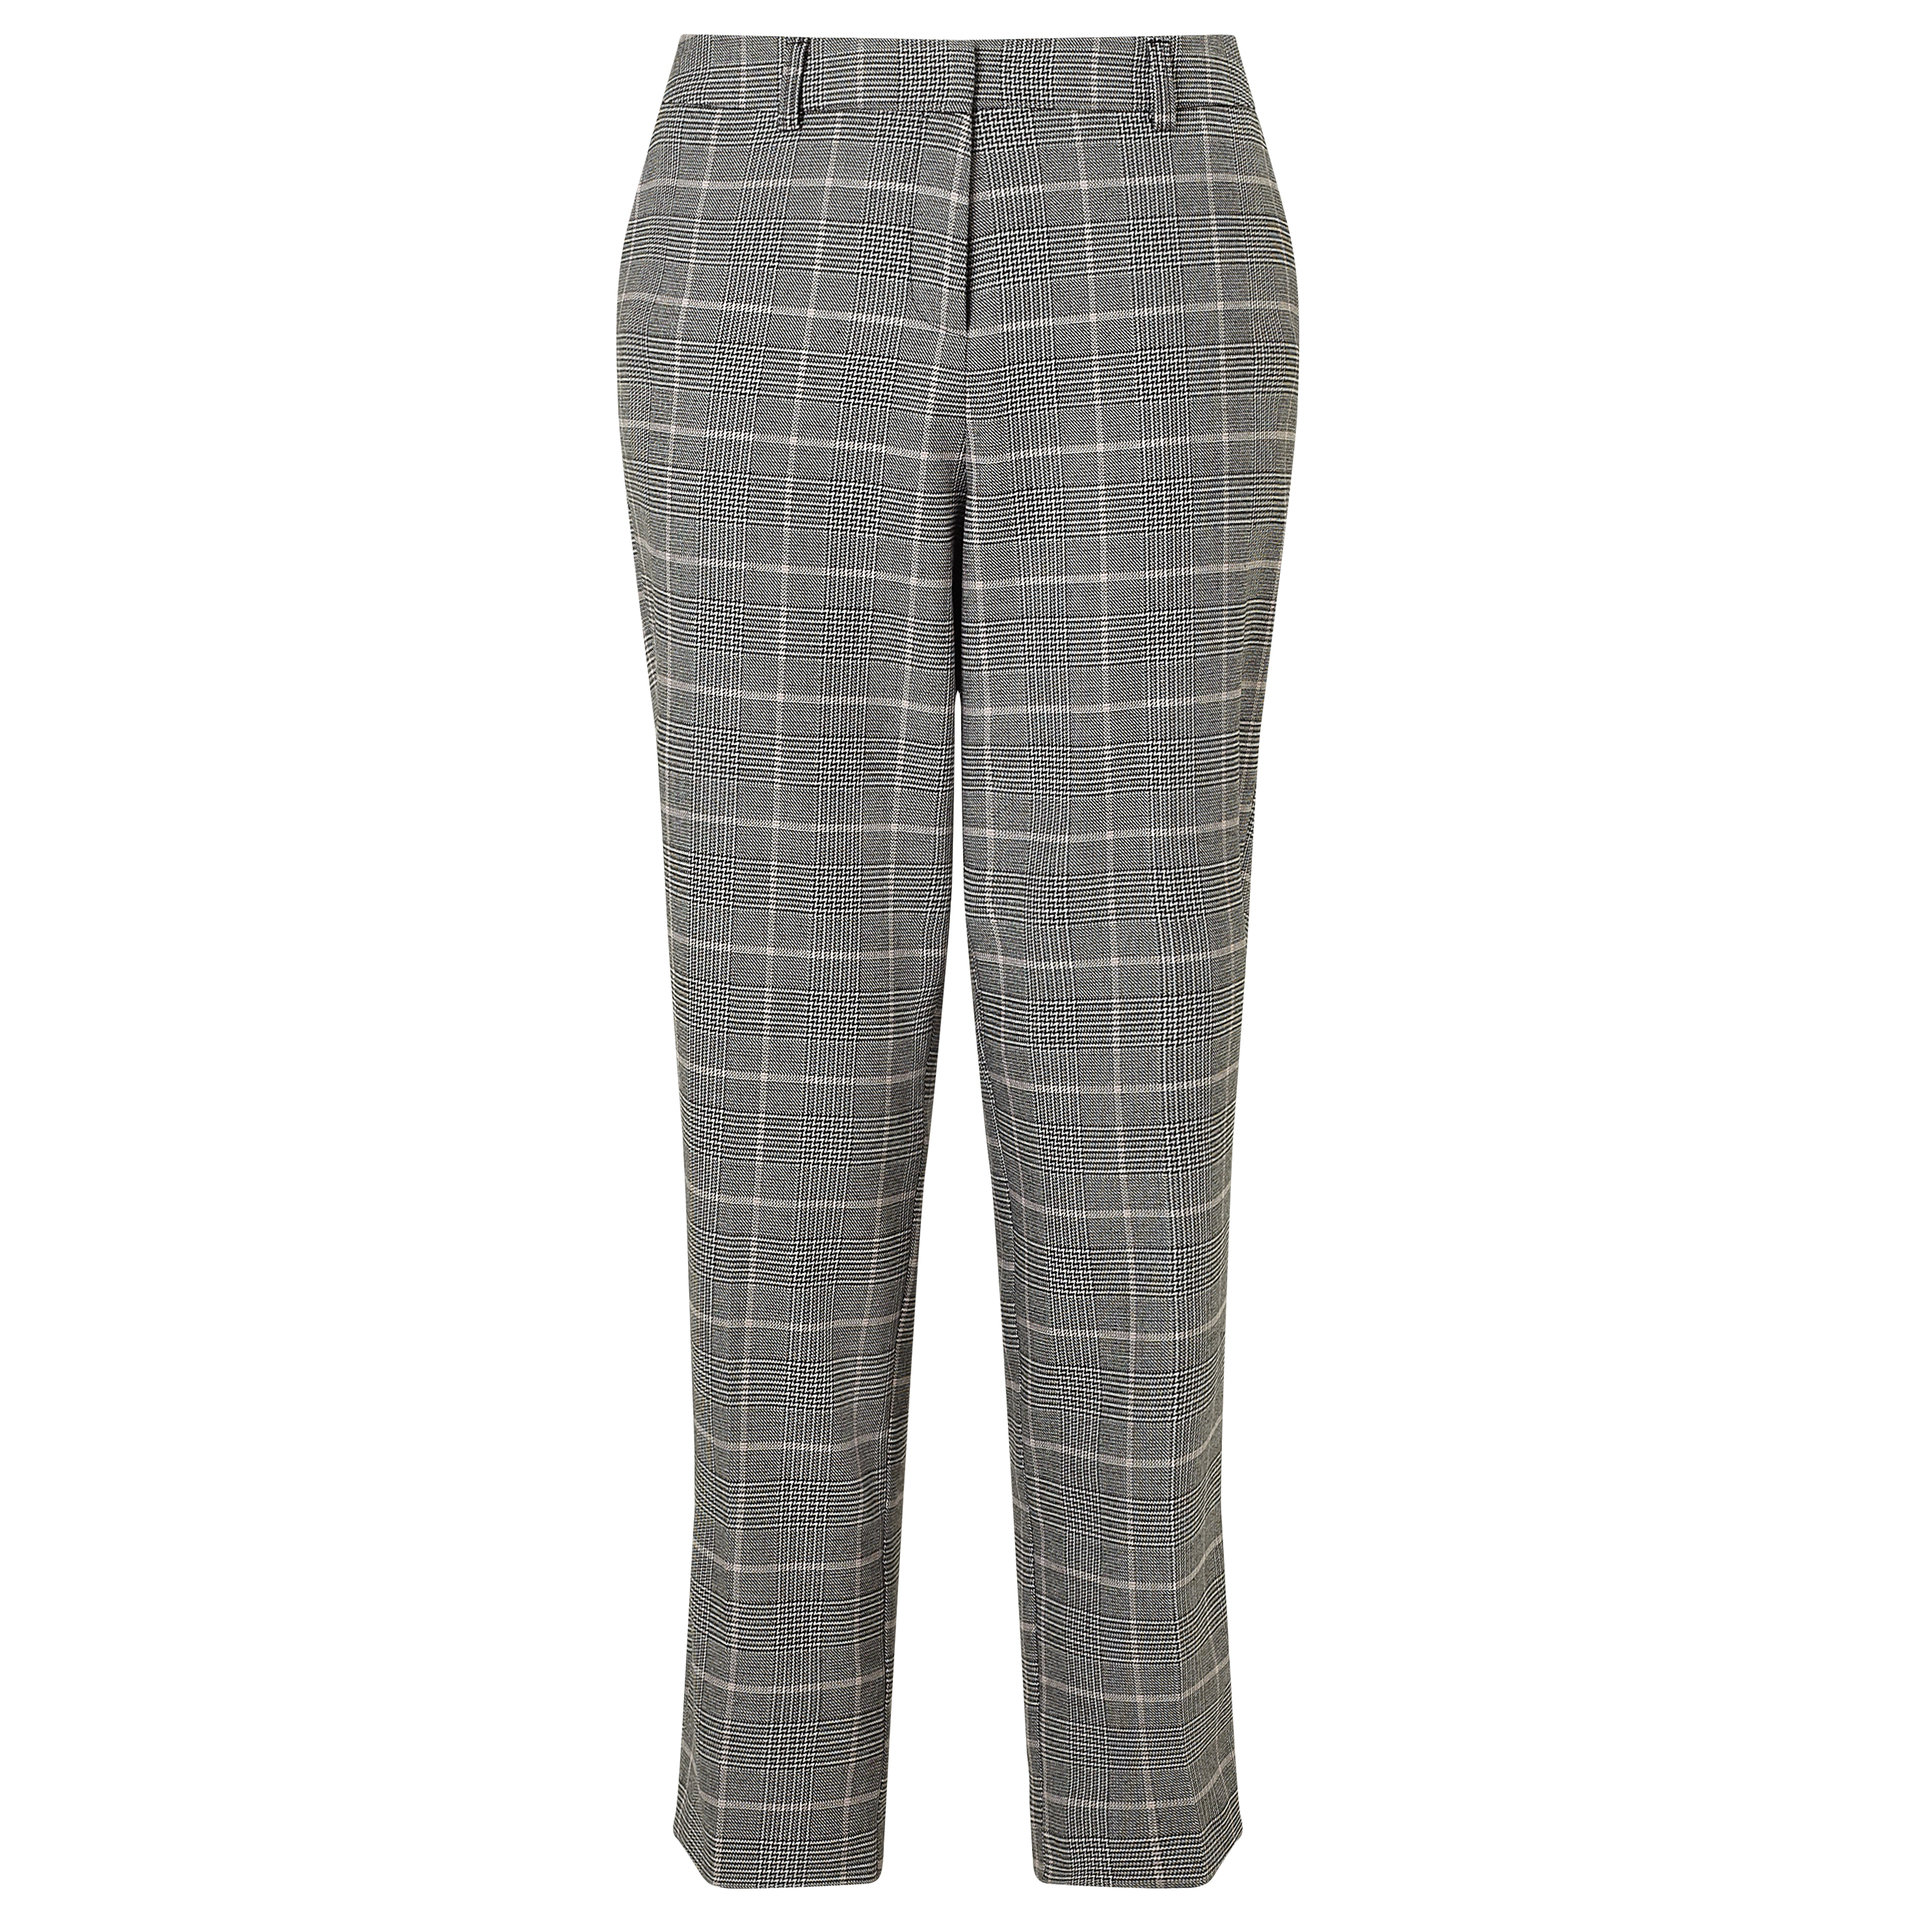 Przegląd spodni od F&F